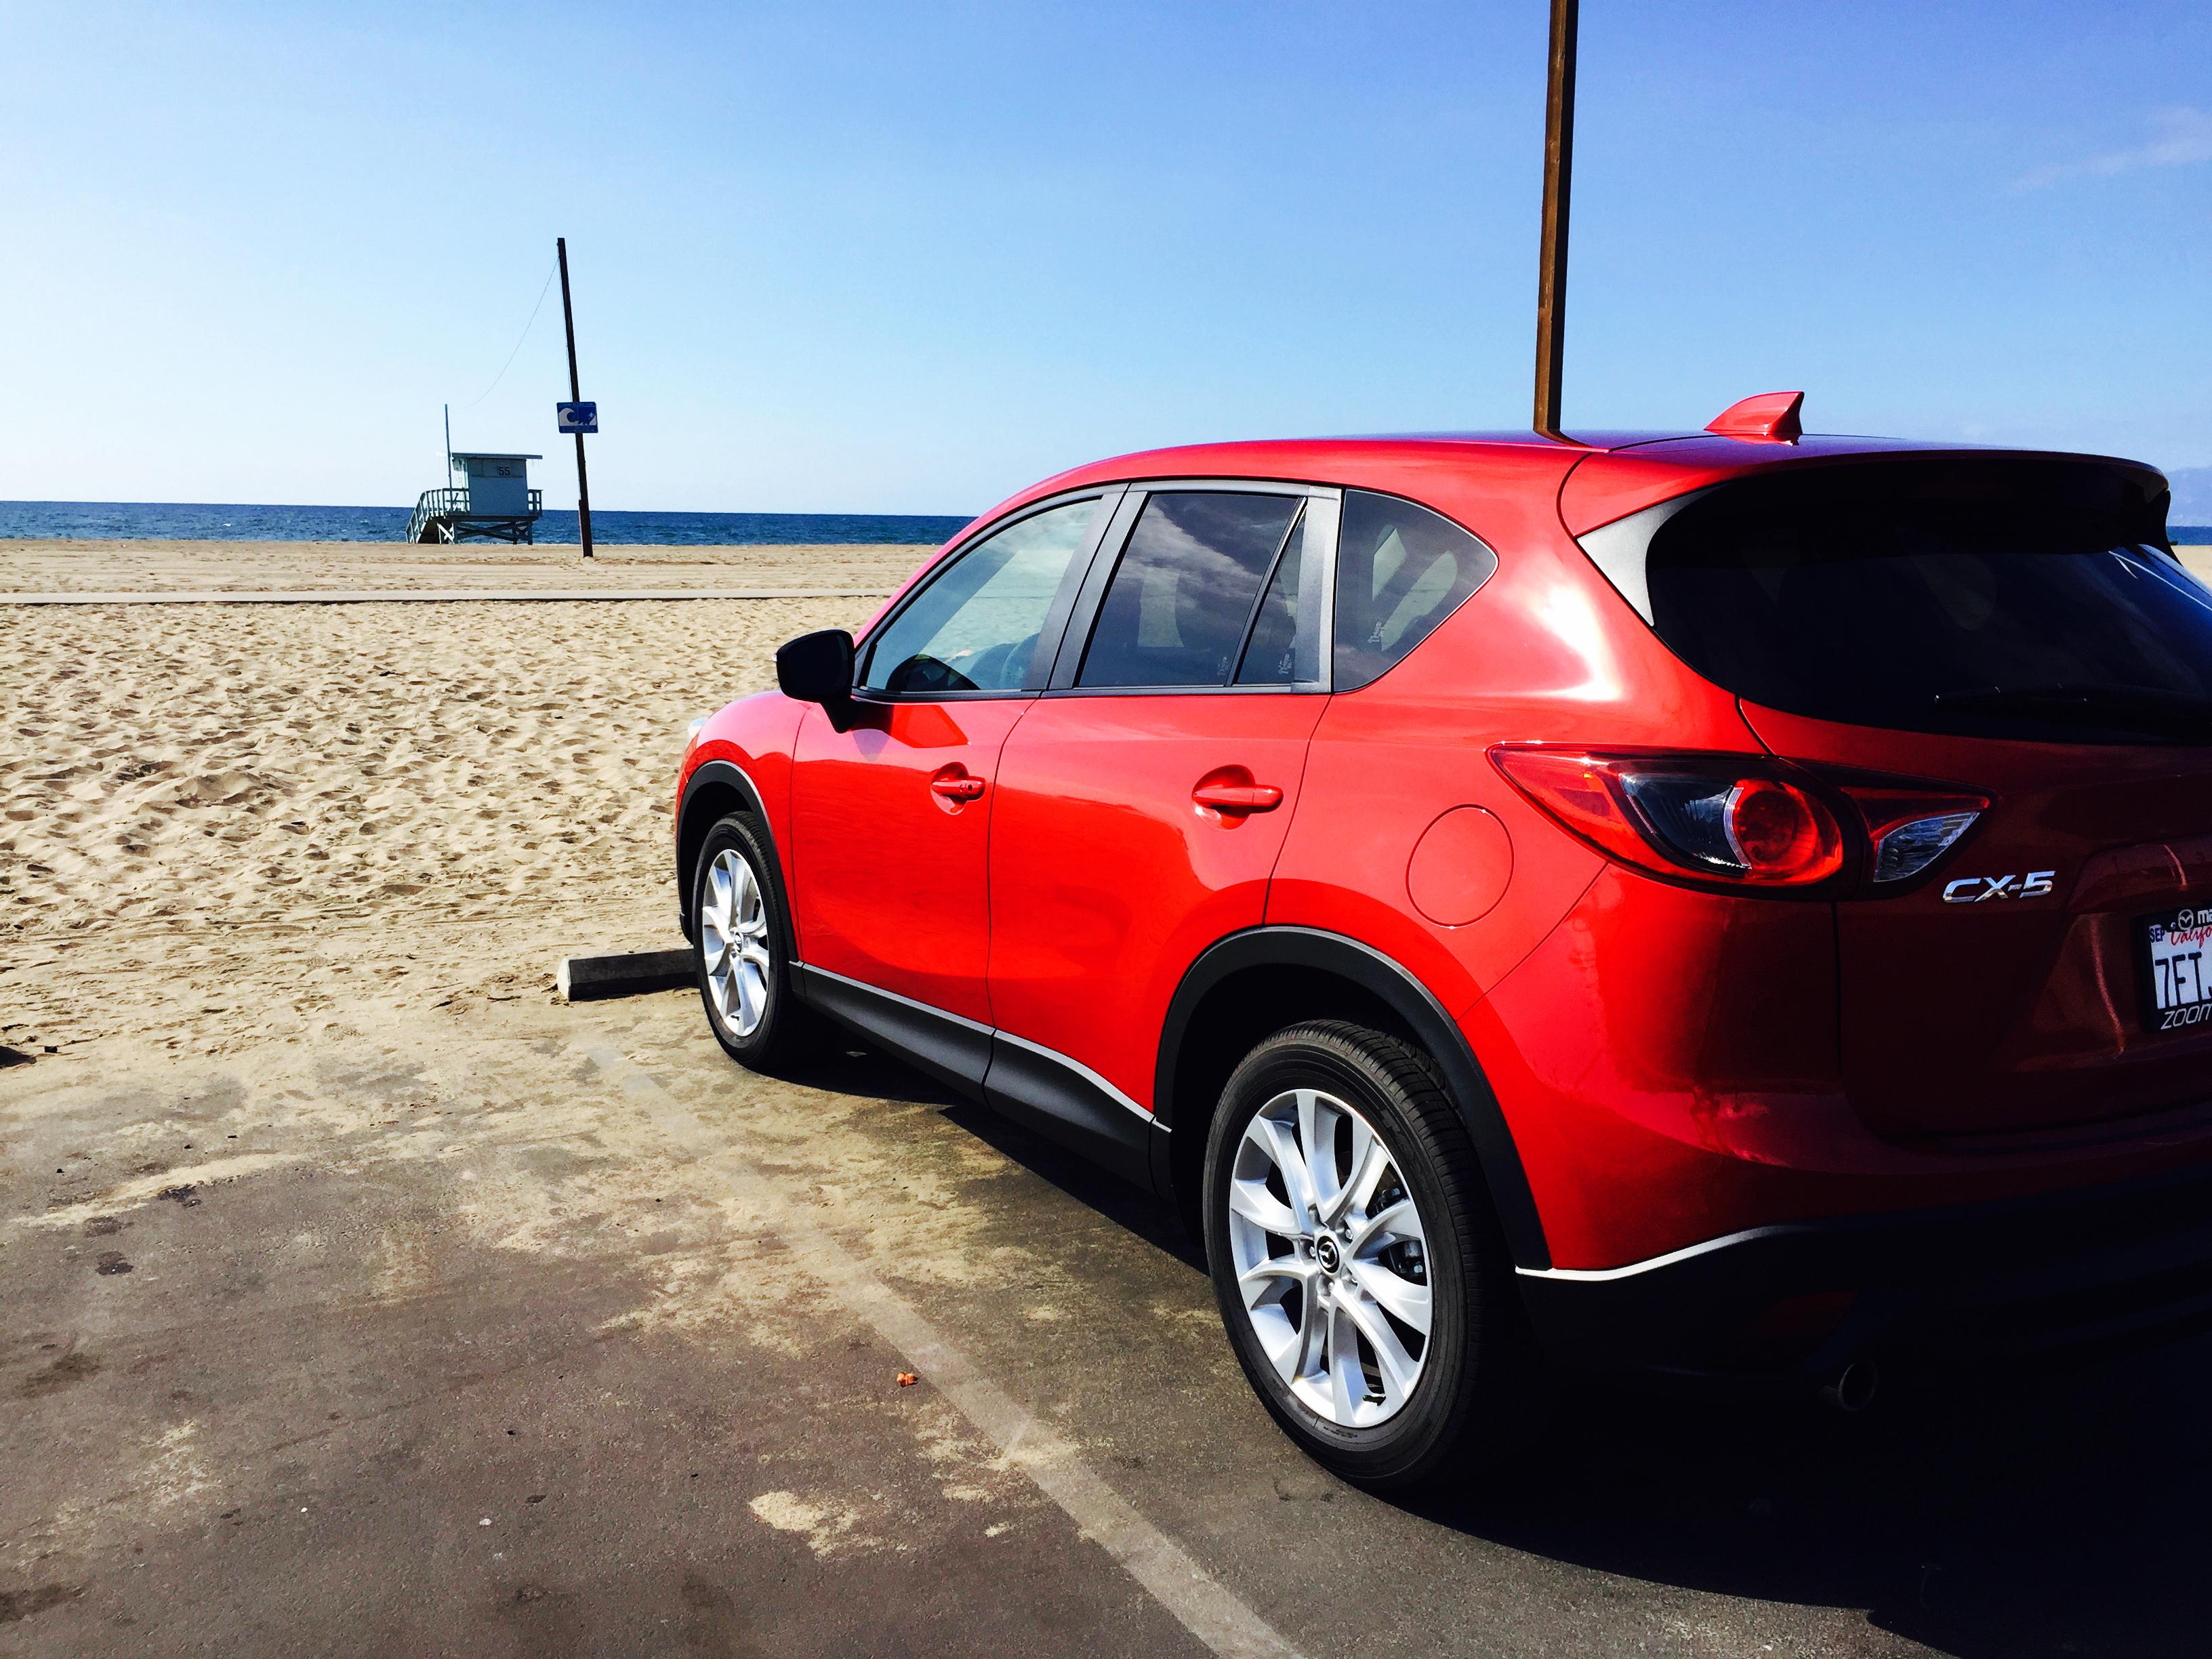 California Cruising in the Mazda CX-5